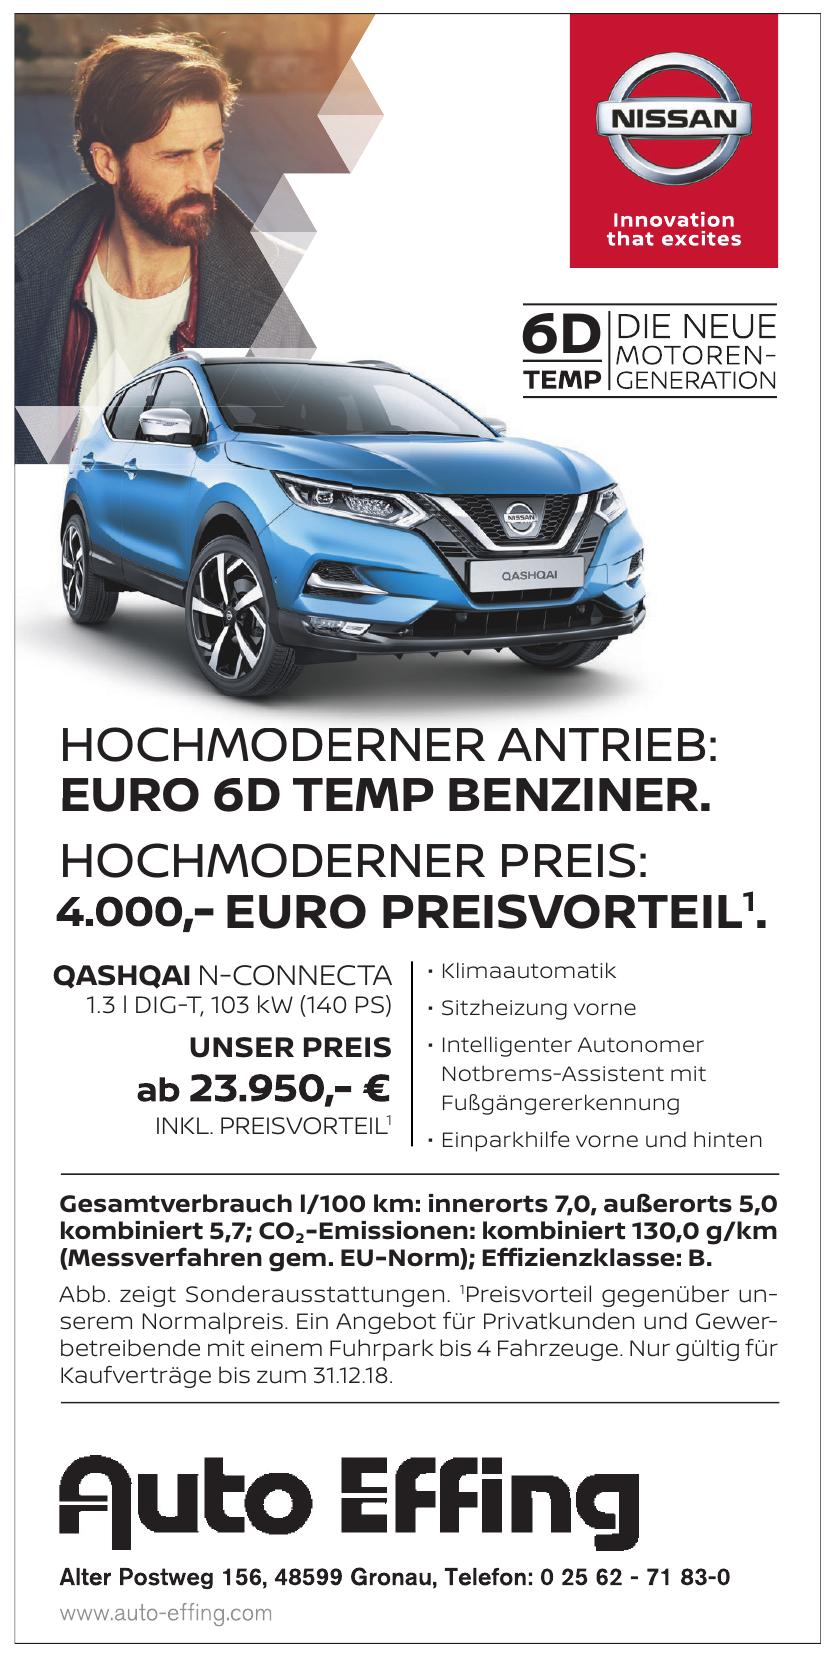 Auto Effing GmbH